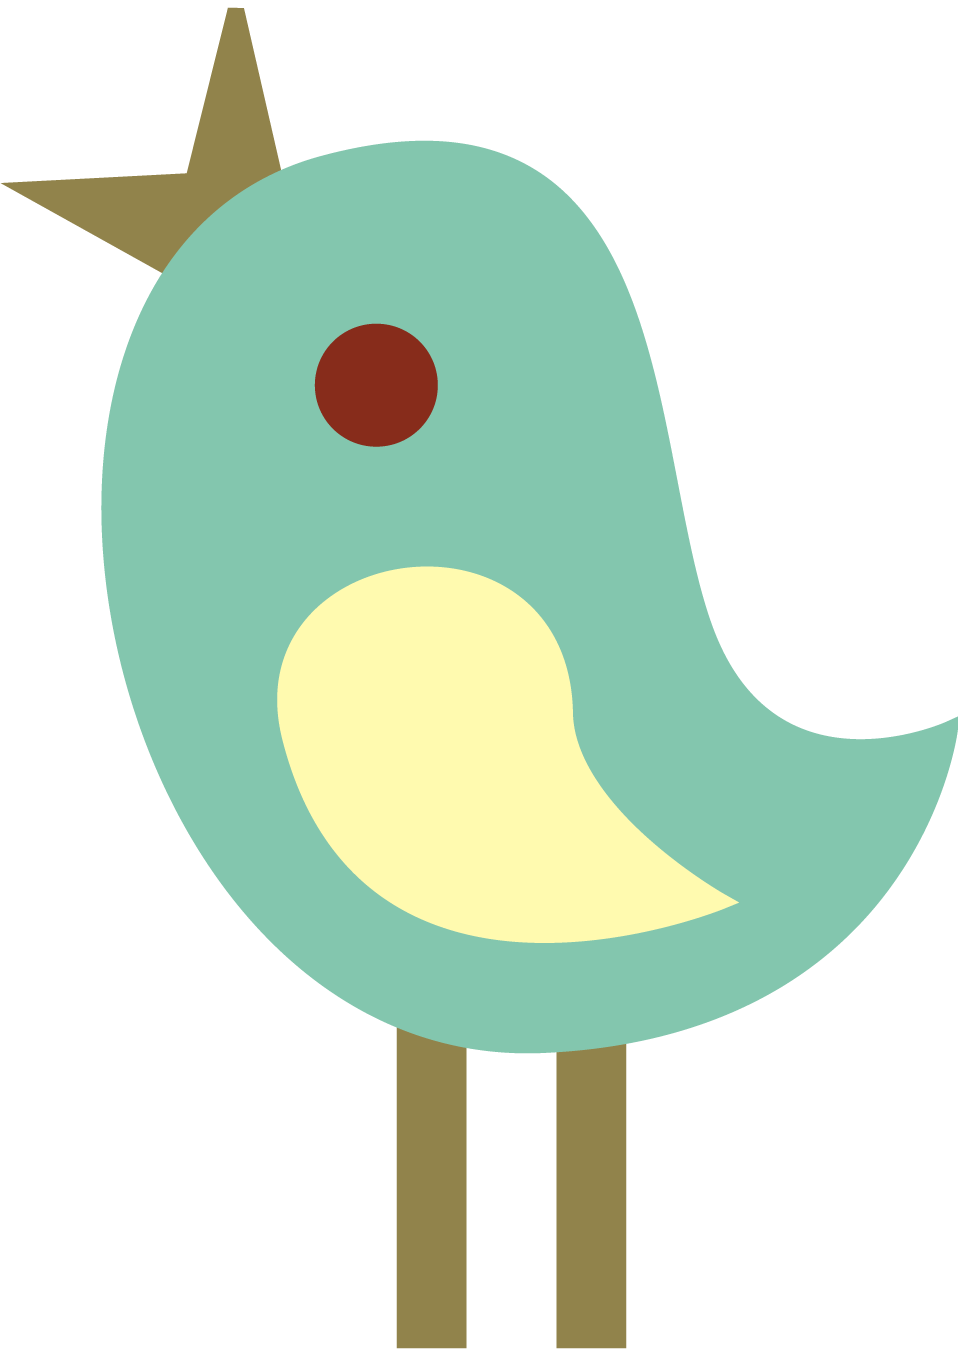 Tweet bird free download. Hurricane clipart cute